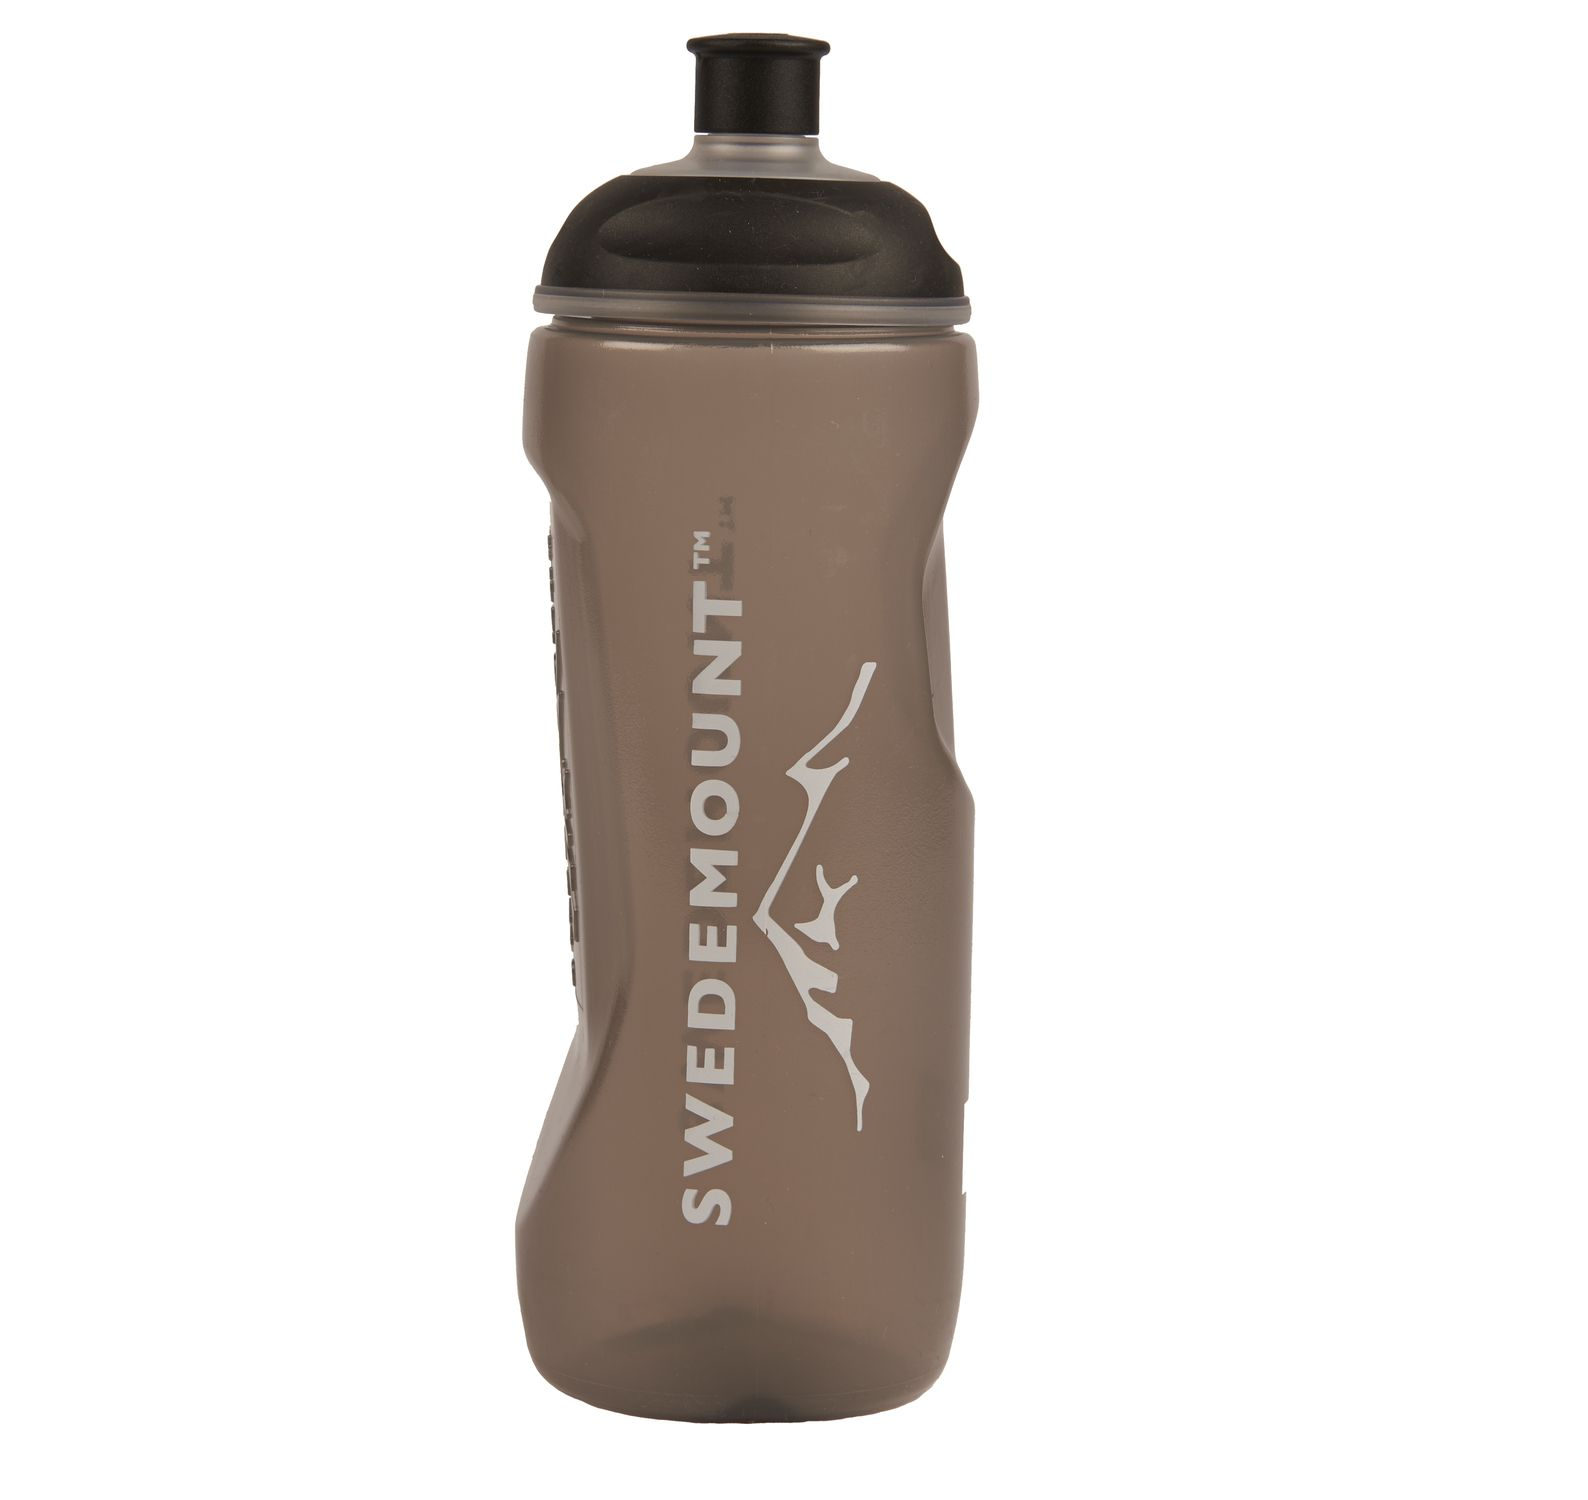 Swedemount Plastic Bottle, Black, Onesize, Swedemount